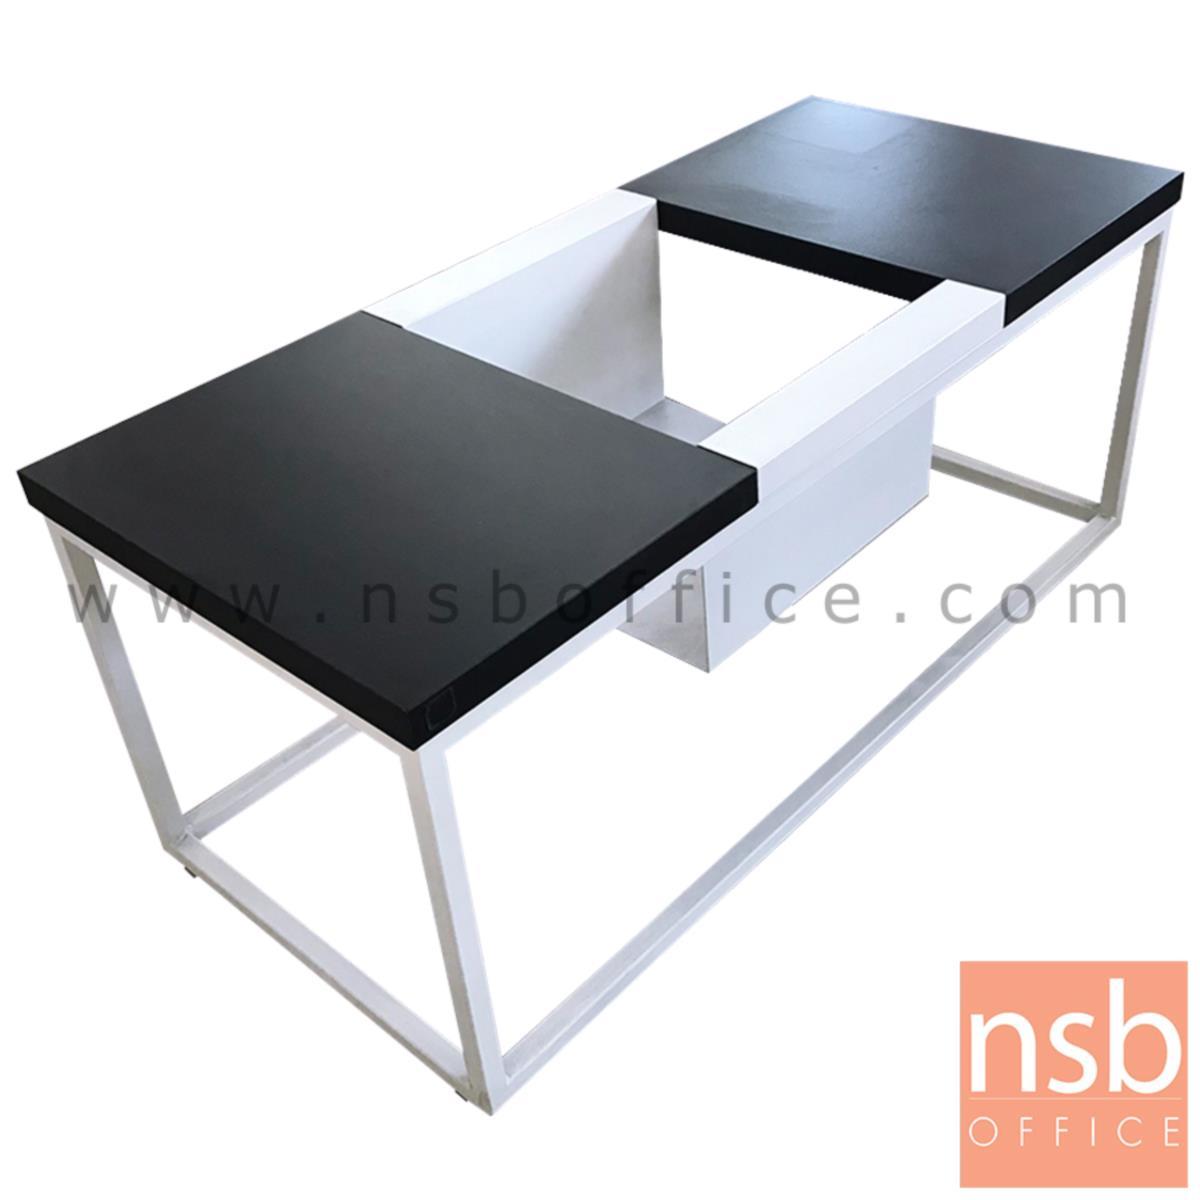 L10A161:โต๊ะกลางโมเดิร์น  ขนาด 90W*38H cm. ขาเหล็กพ่นสีขาว